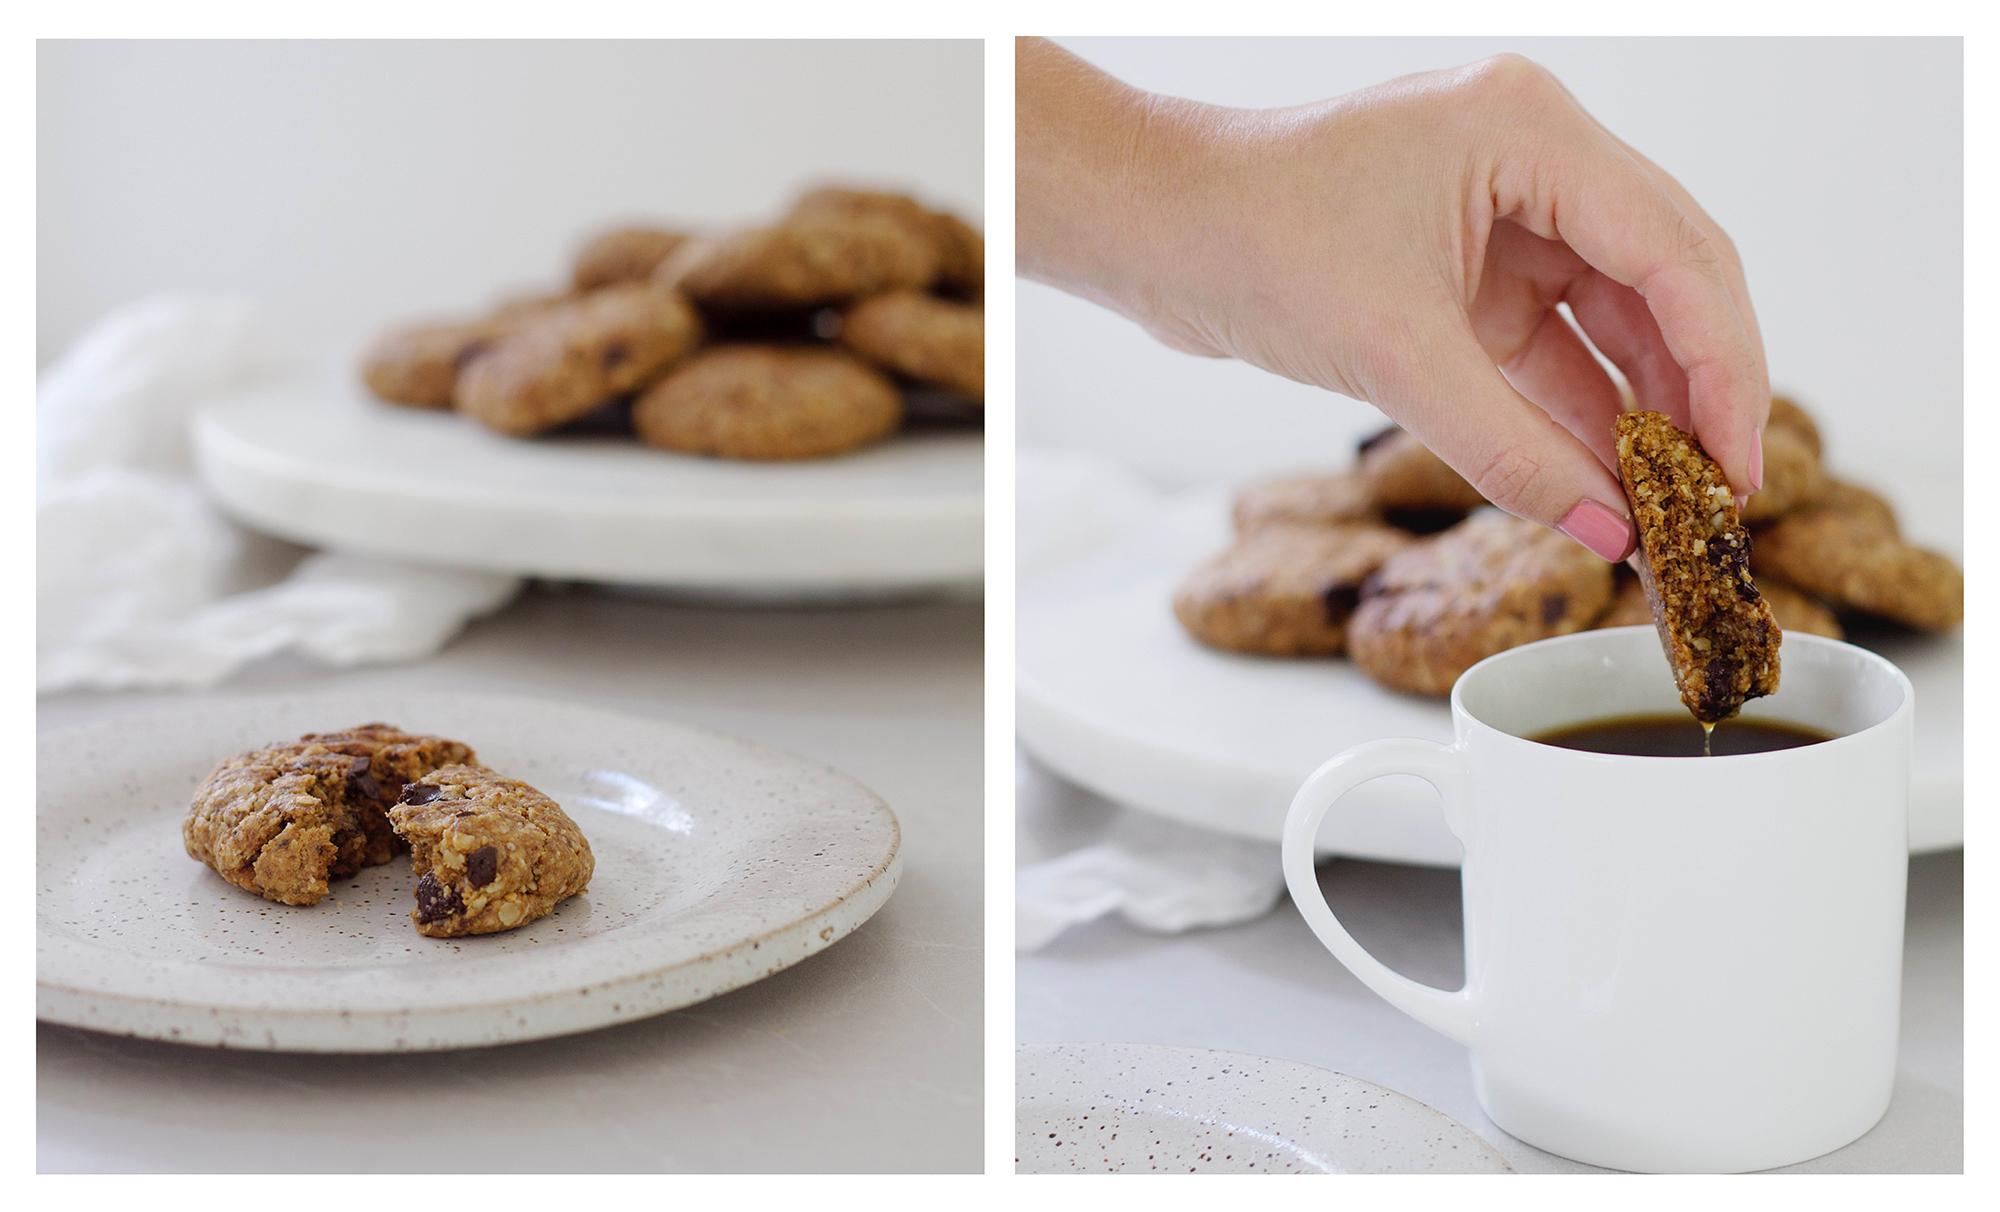 Fix_and_Fogg_Peanut_Butter_Cookies_recipe.jpg